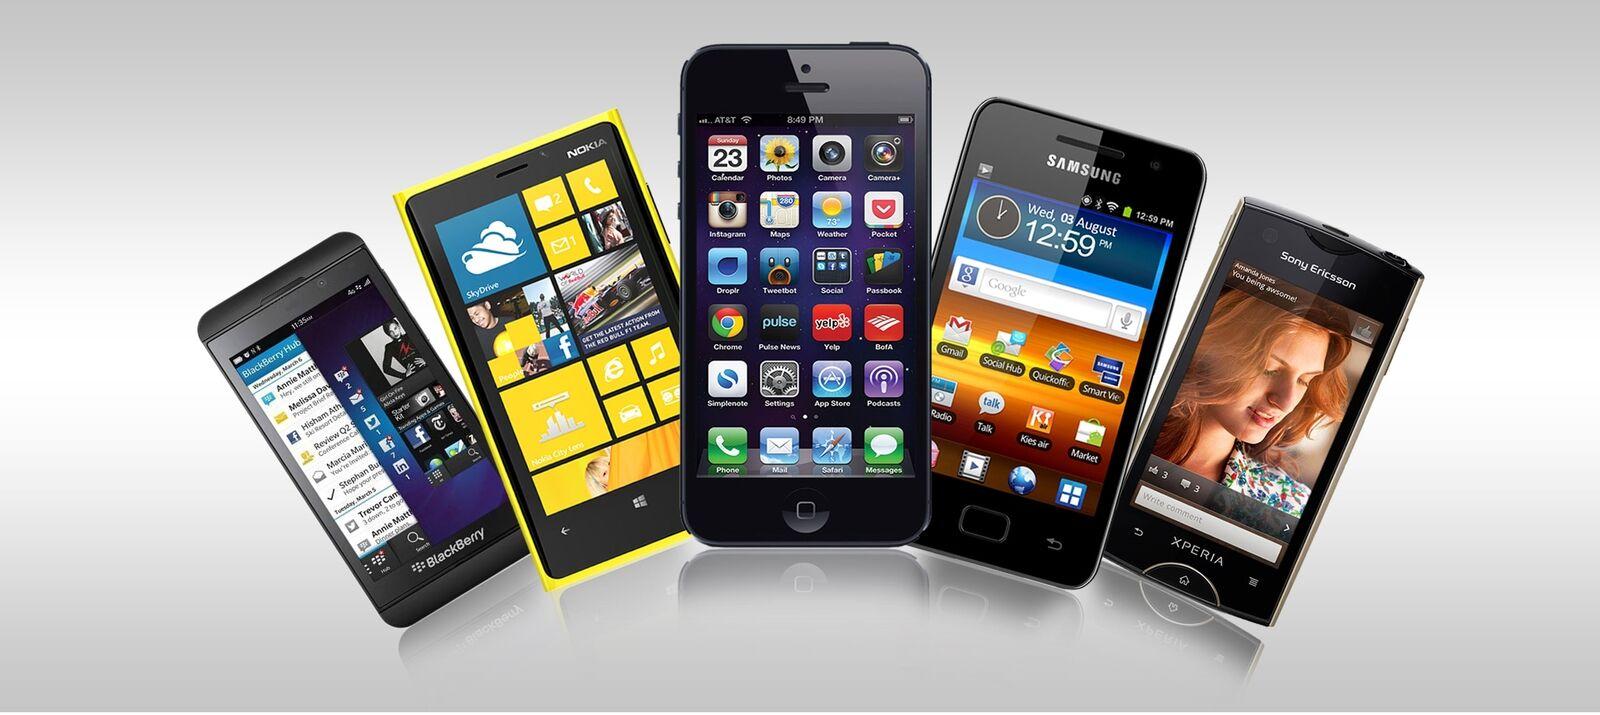 yalcomm_mobiles